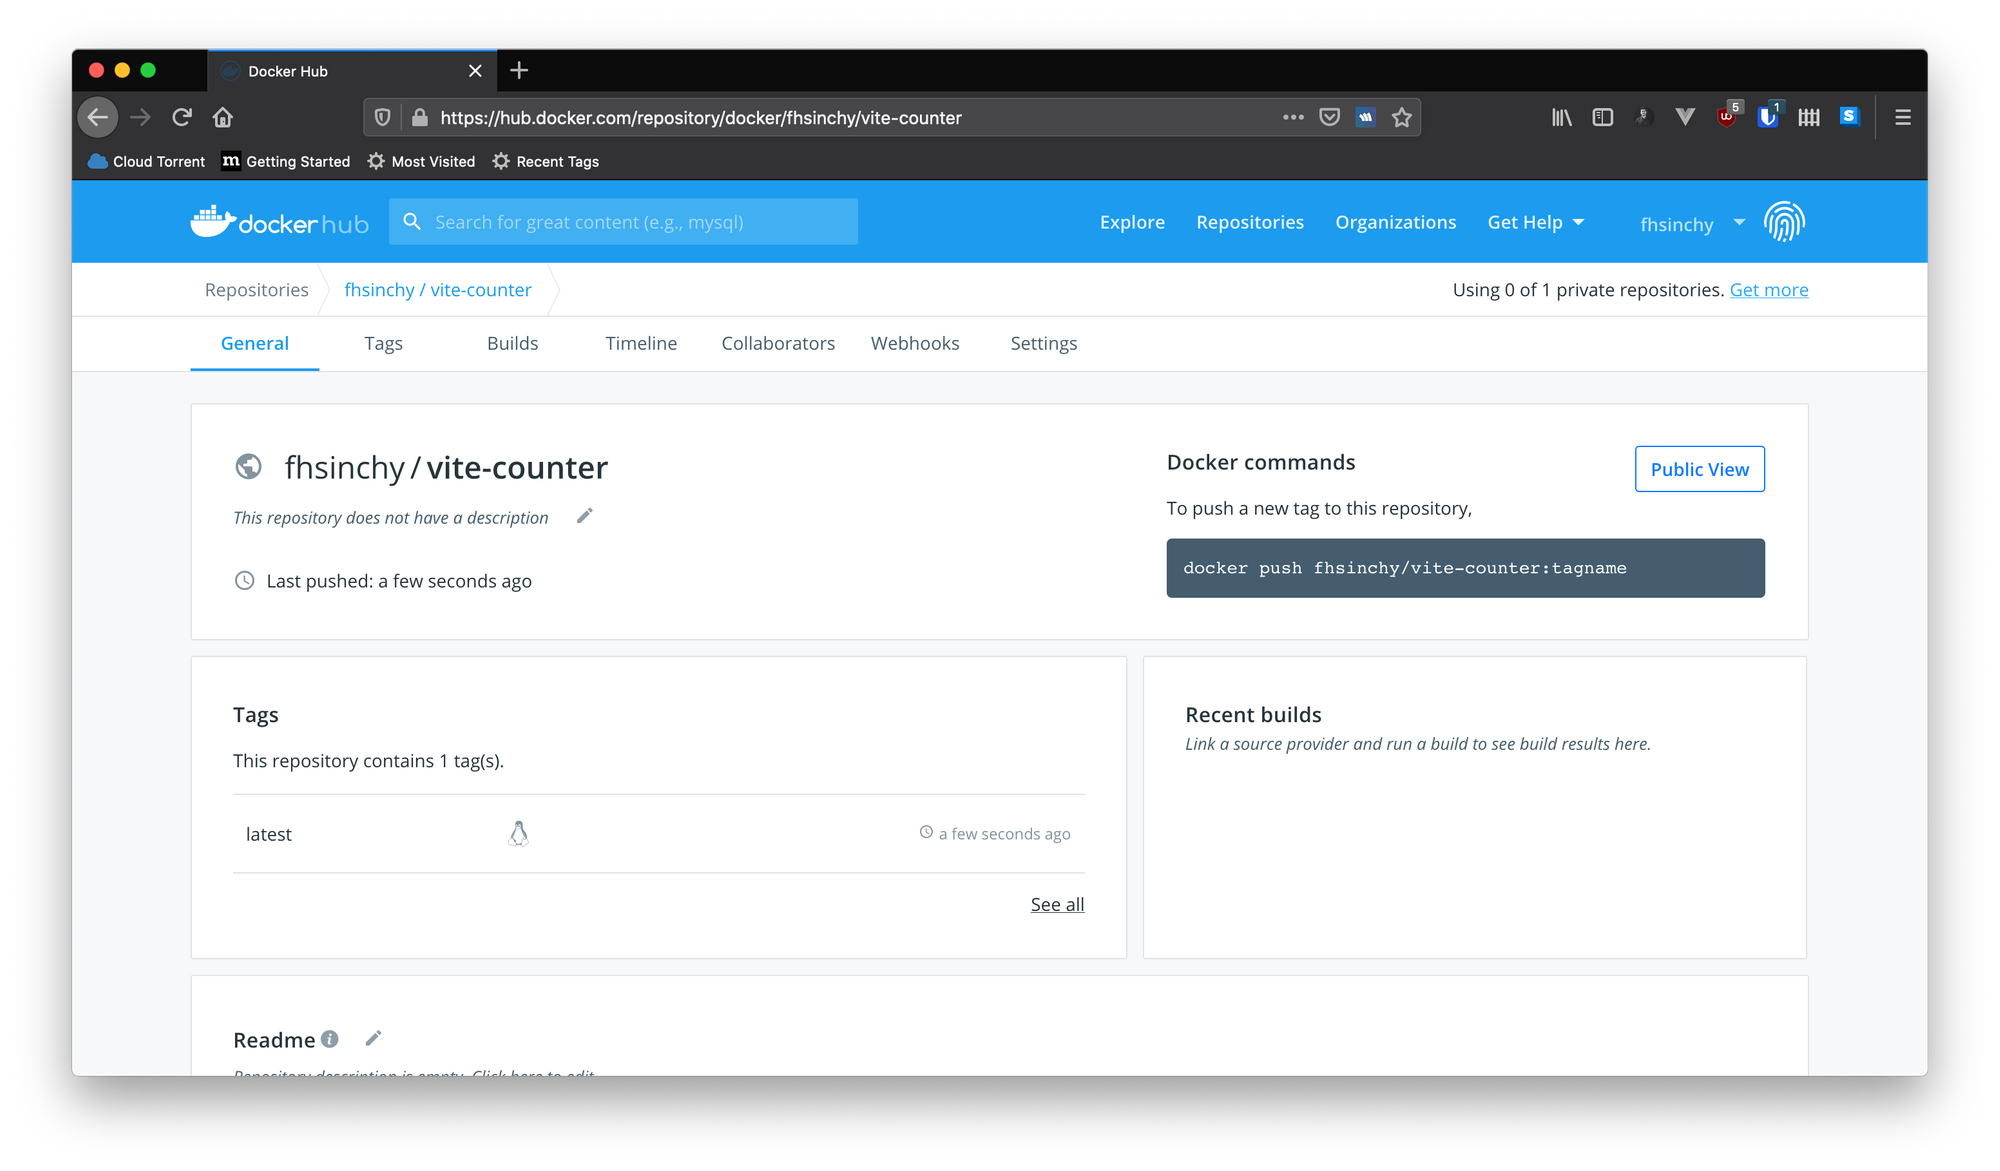 Docker Hubでのイメージの表示